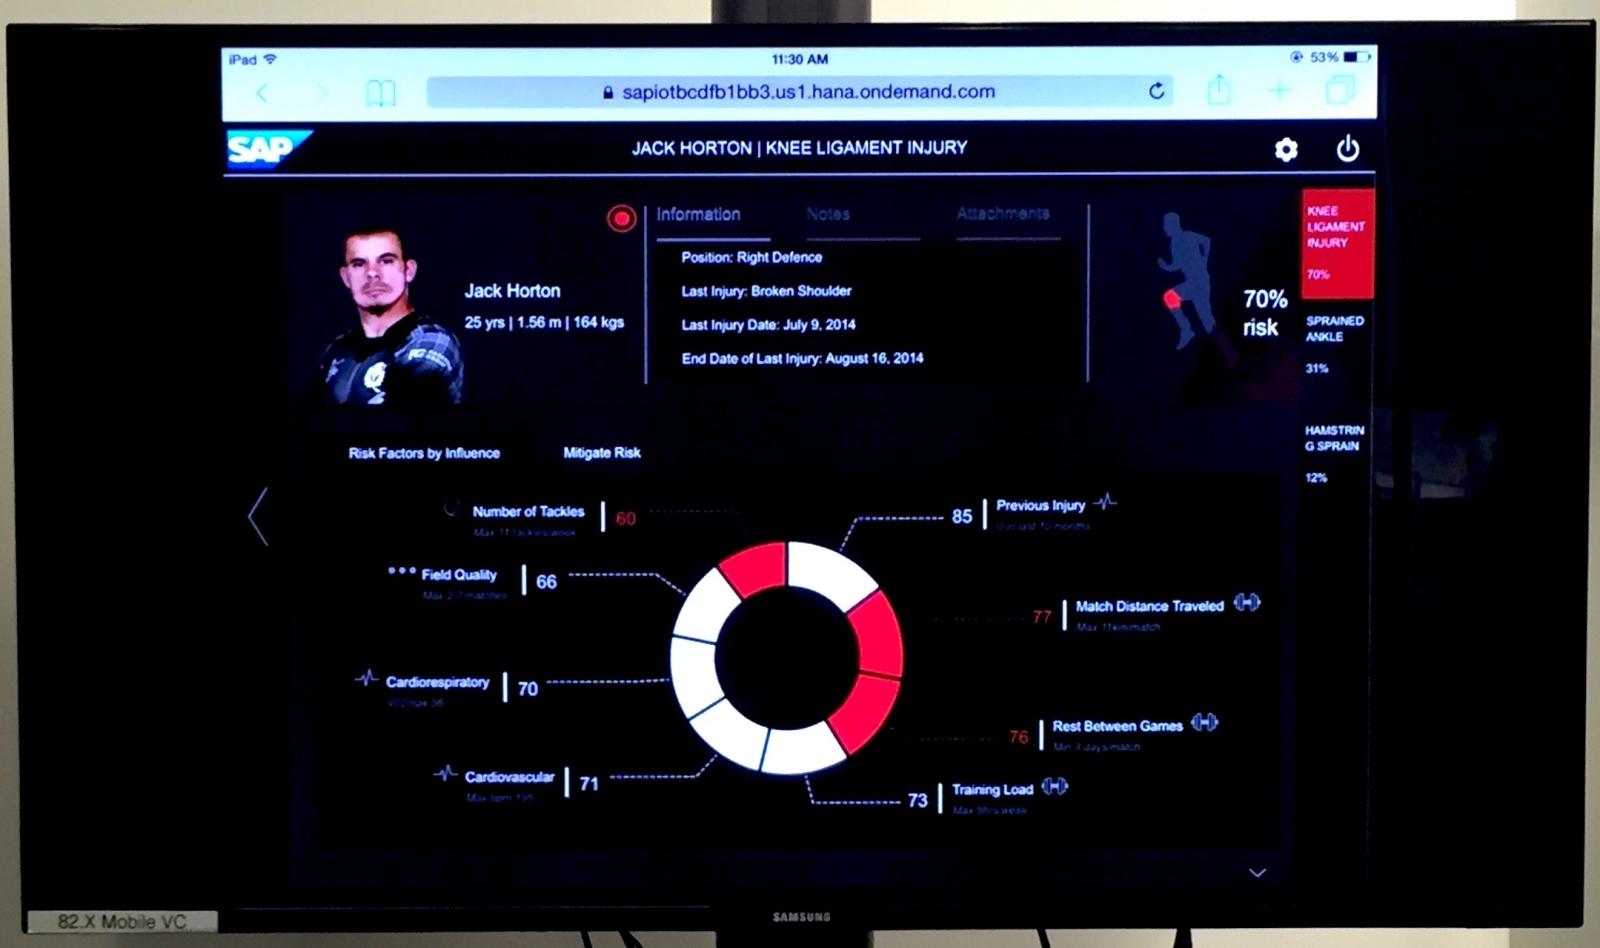 SAP Injury Risk Monitor